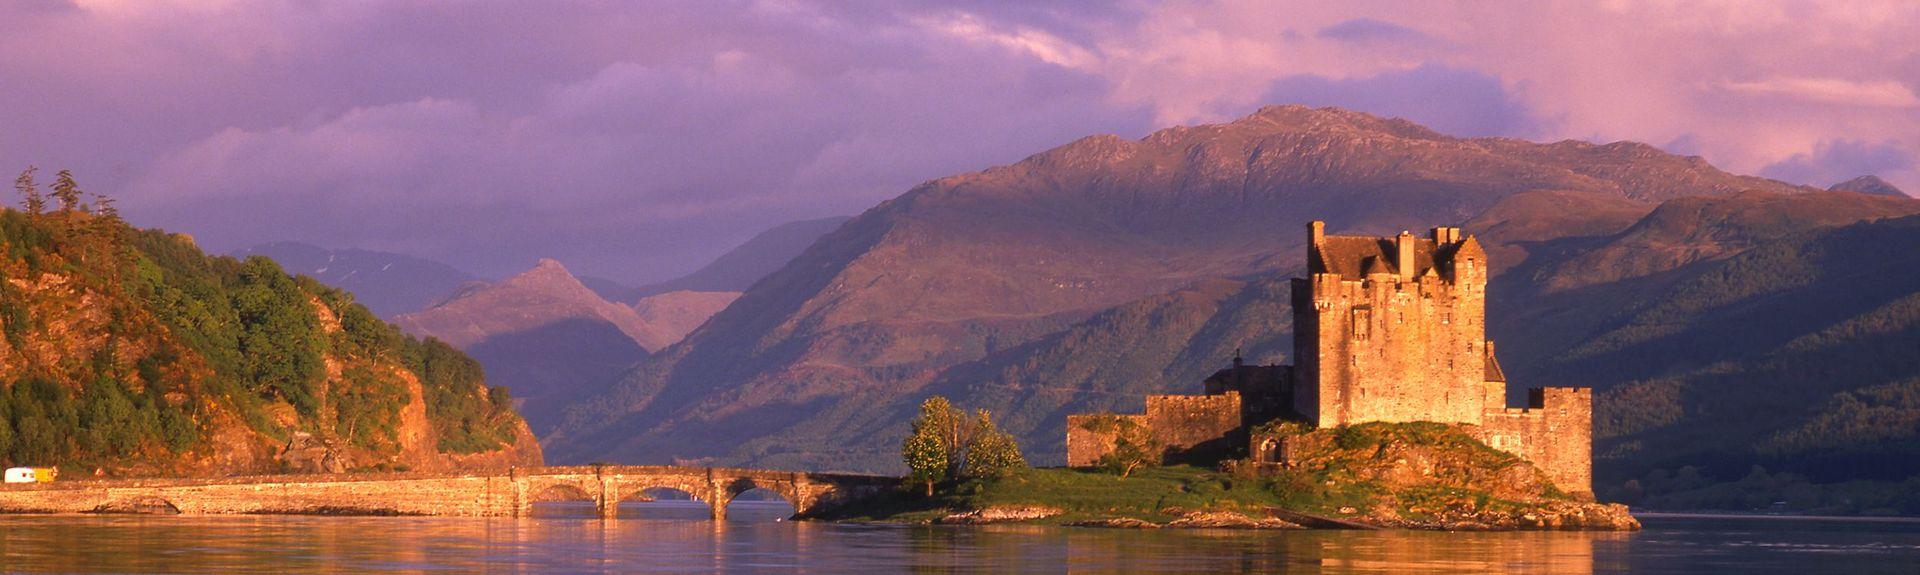 Glen Coe Mountain Resort, Ballachulish, Schotland, Verenigd Koninkrijk